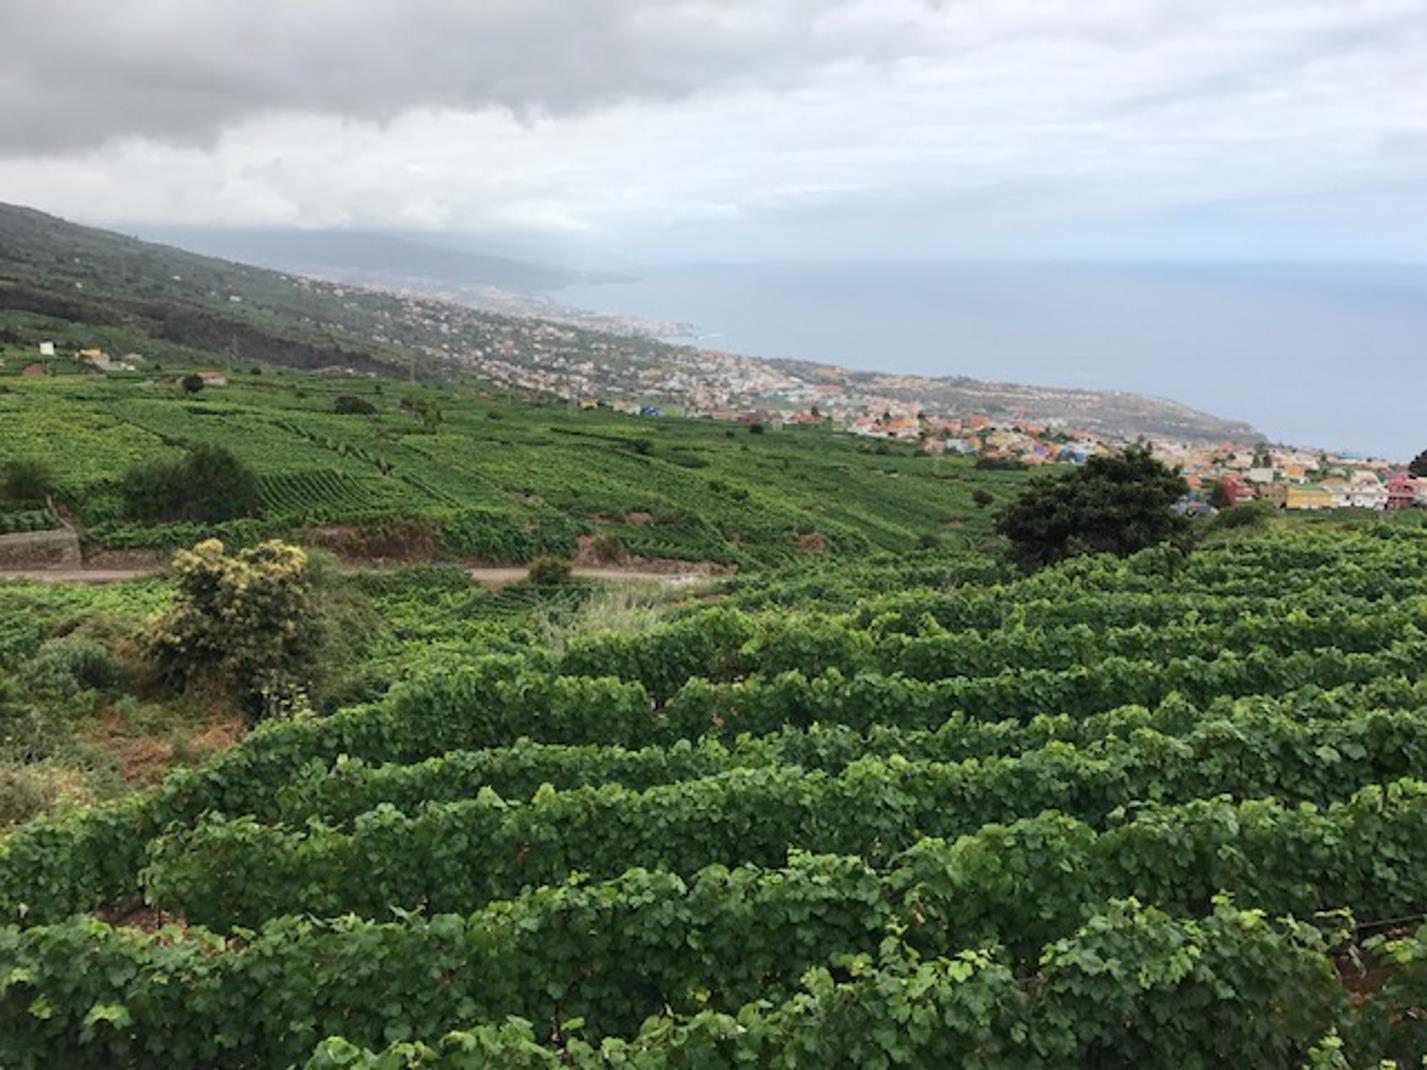 Guachinche-4-hour-Gastronomic-Tour-in-Tenerife-4